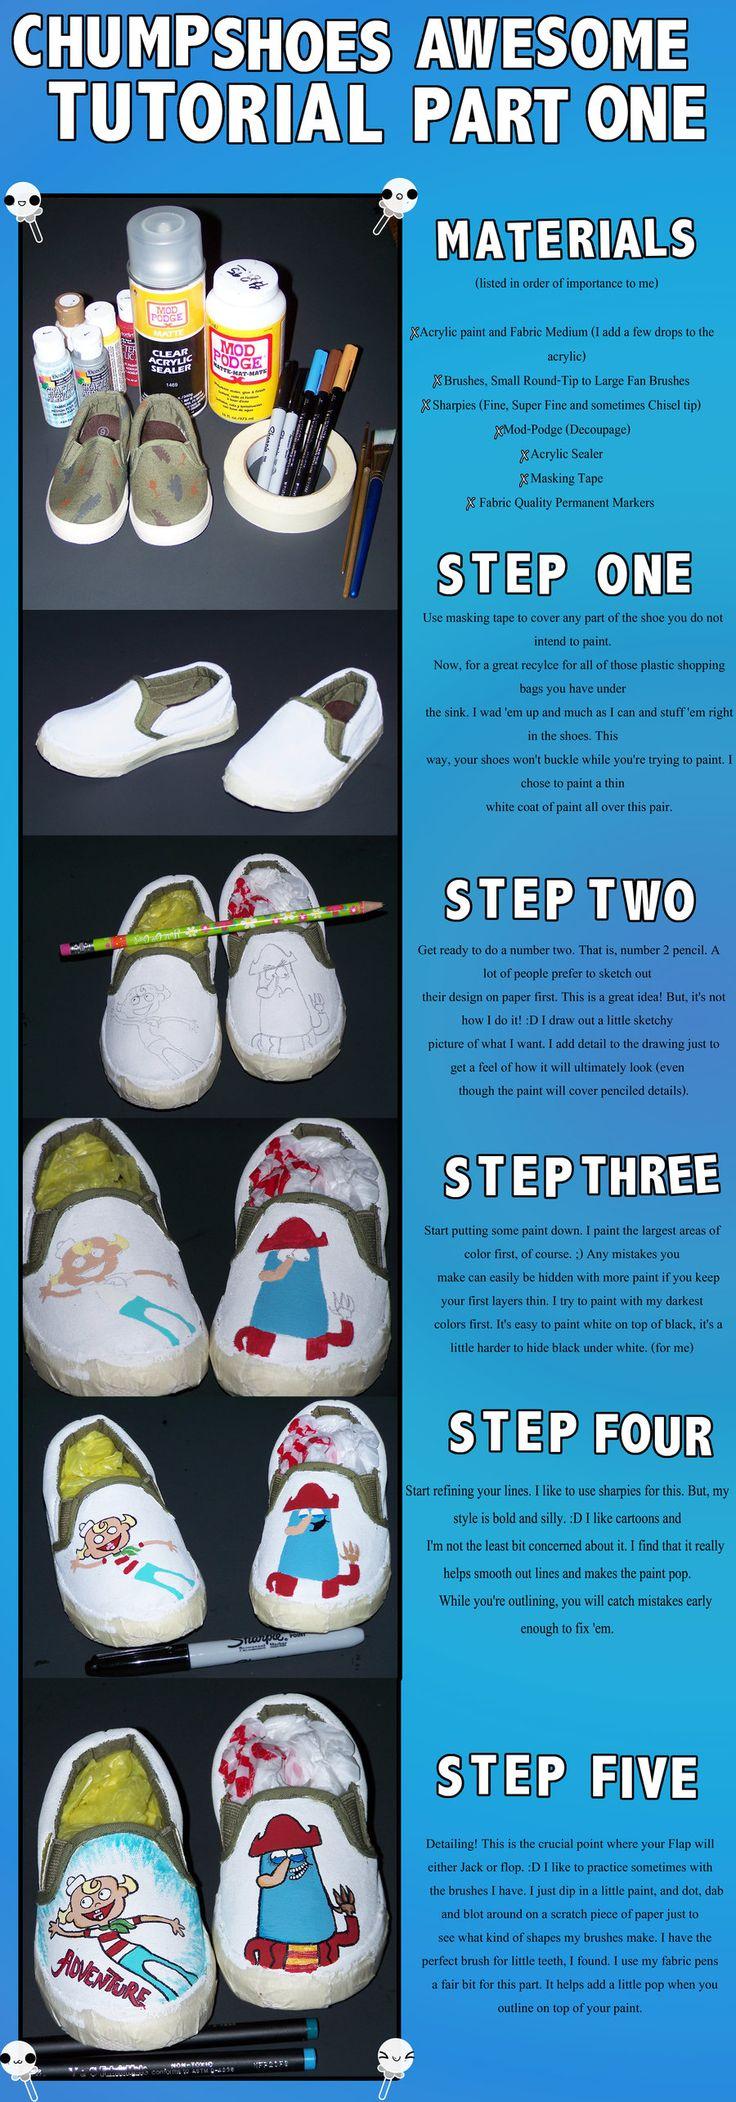 Painting Shoes Tutorial I by ChumpShoes.deviantart.com on @deviantART - part 1